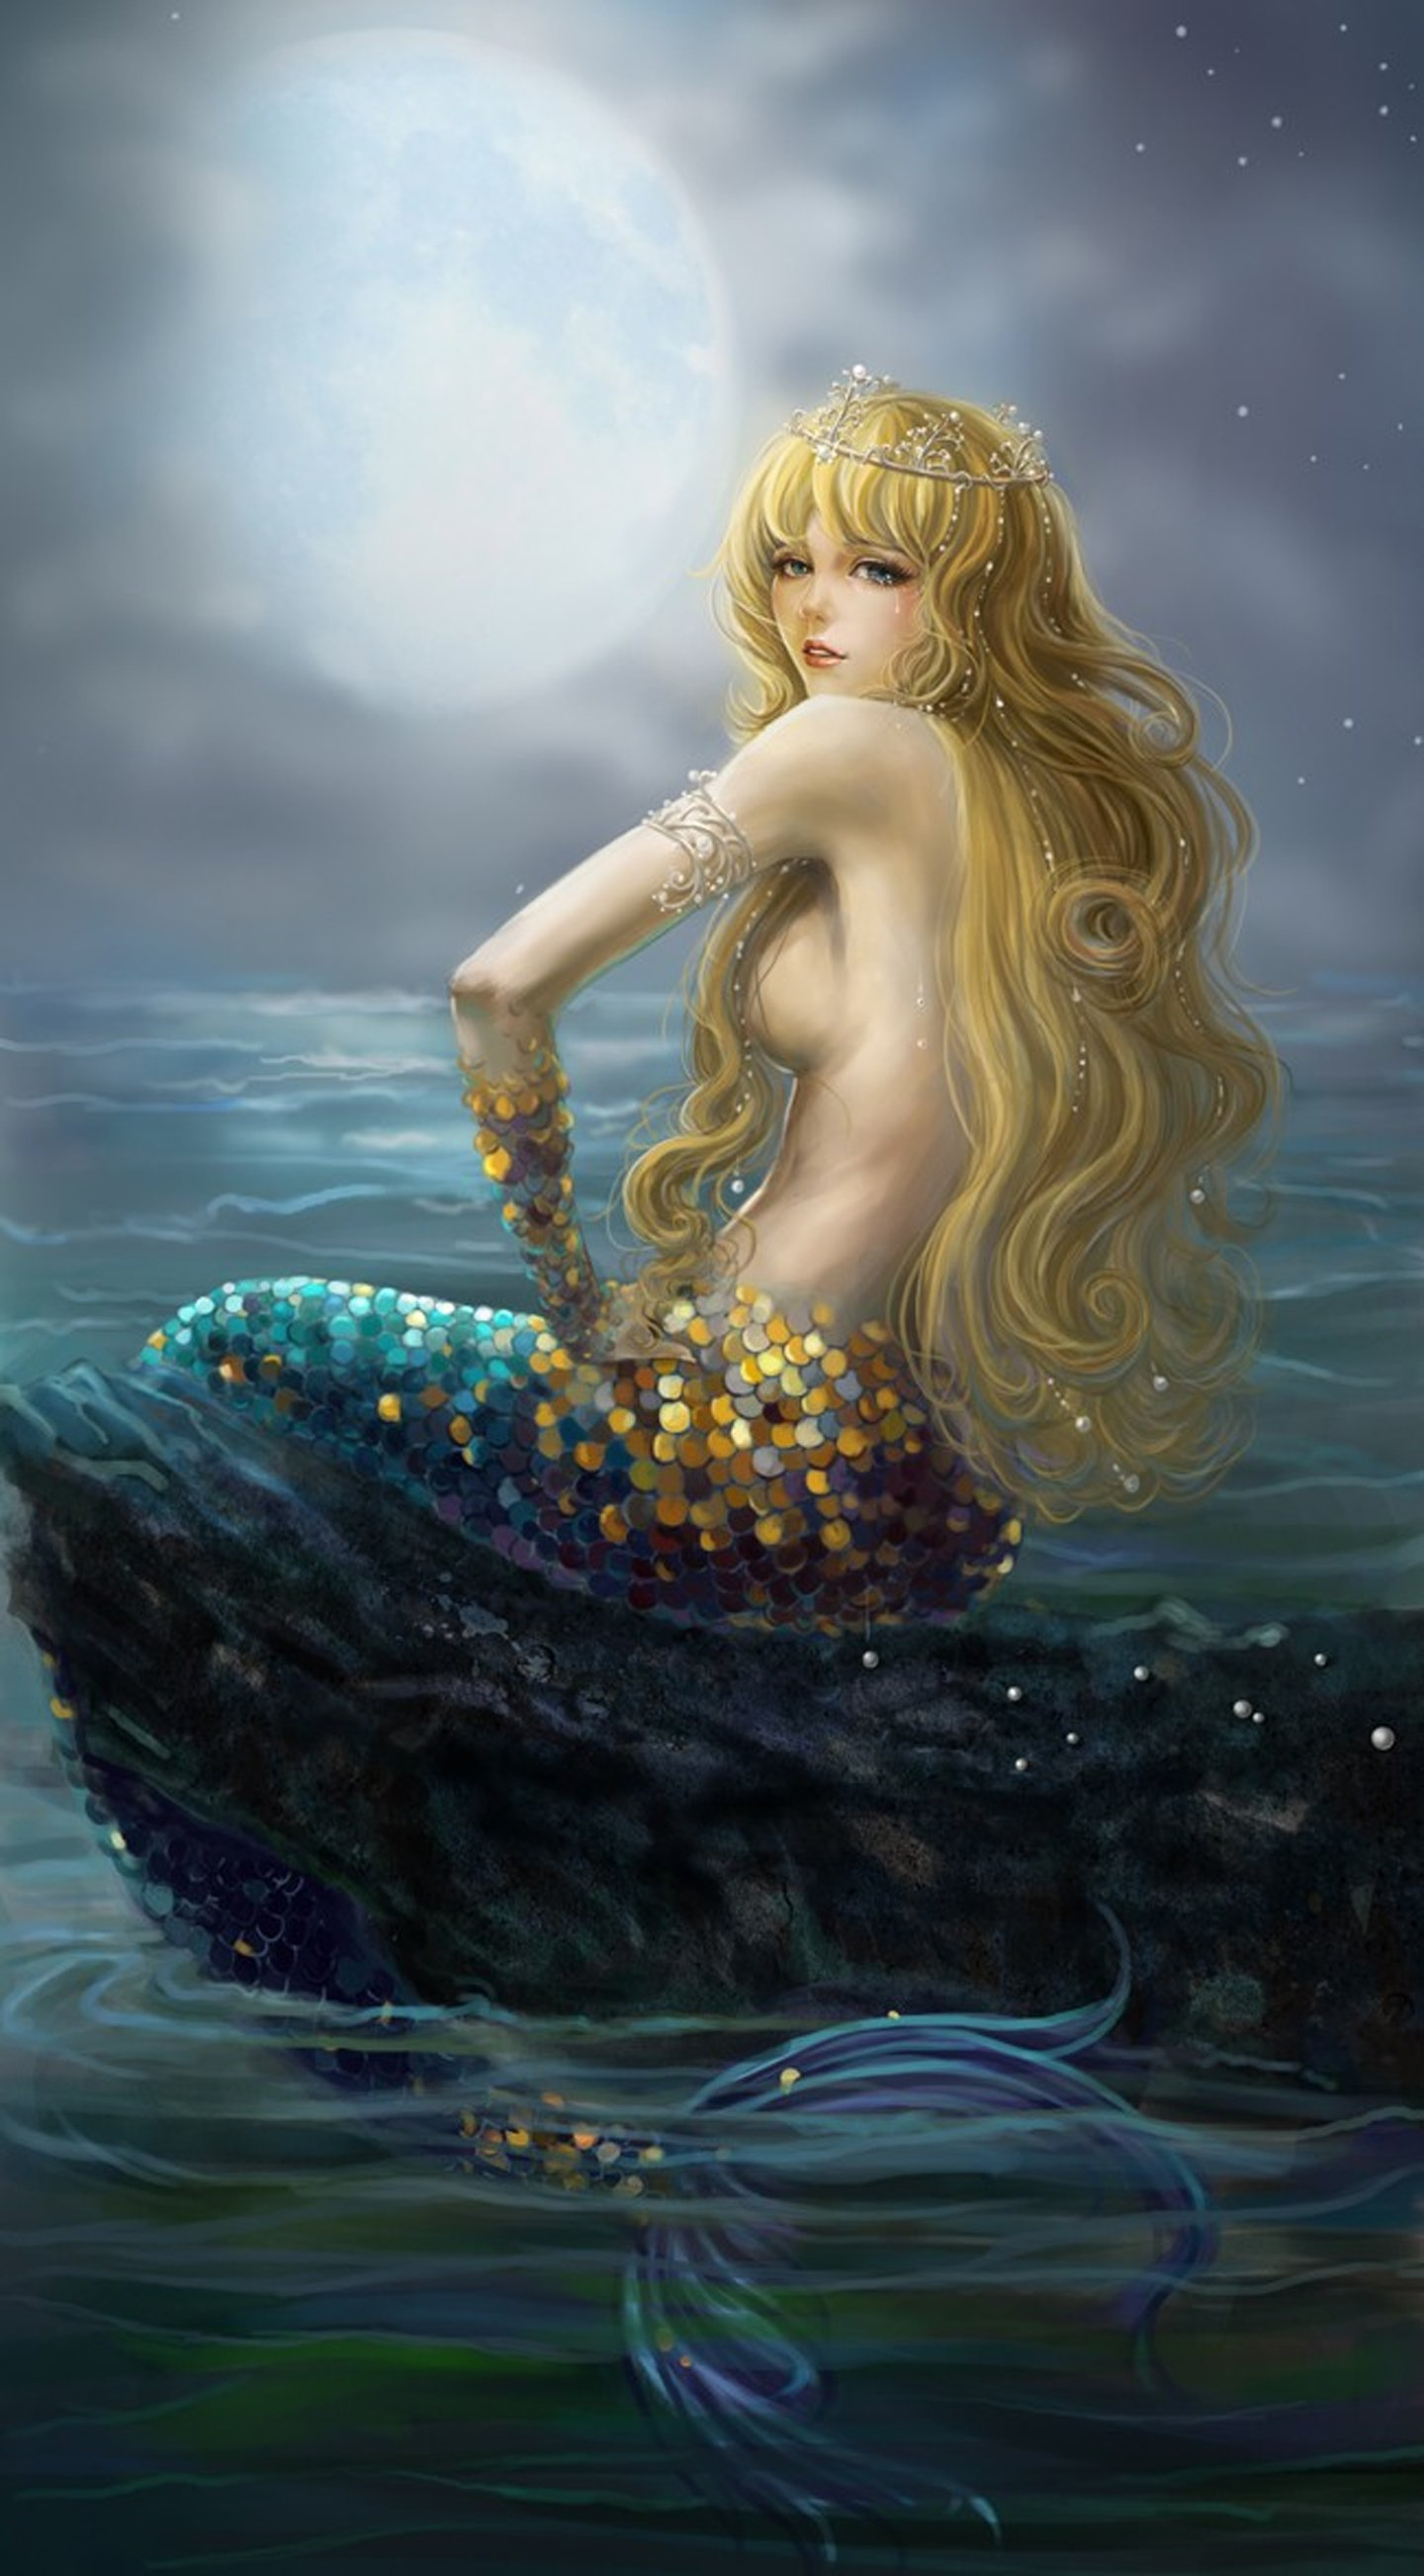 Mermaid fantasy sex nackt scene